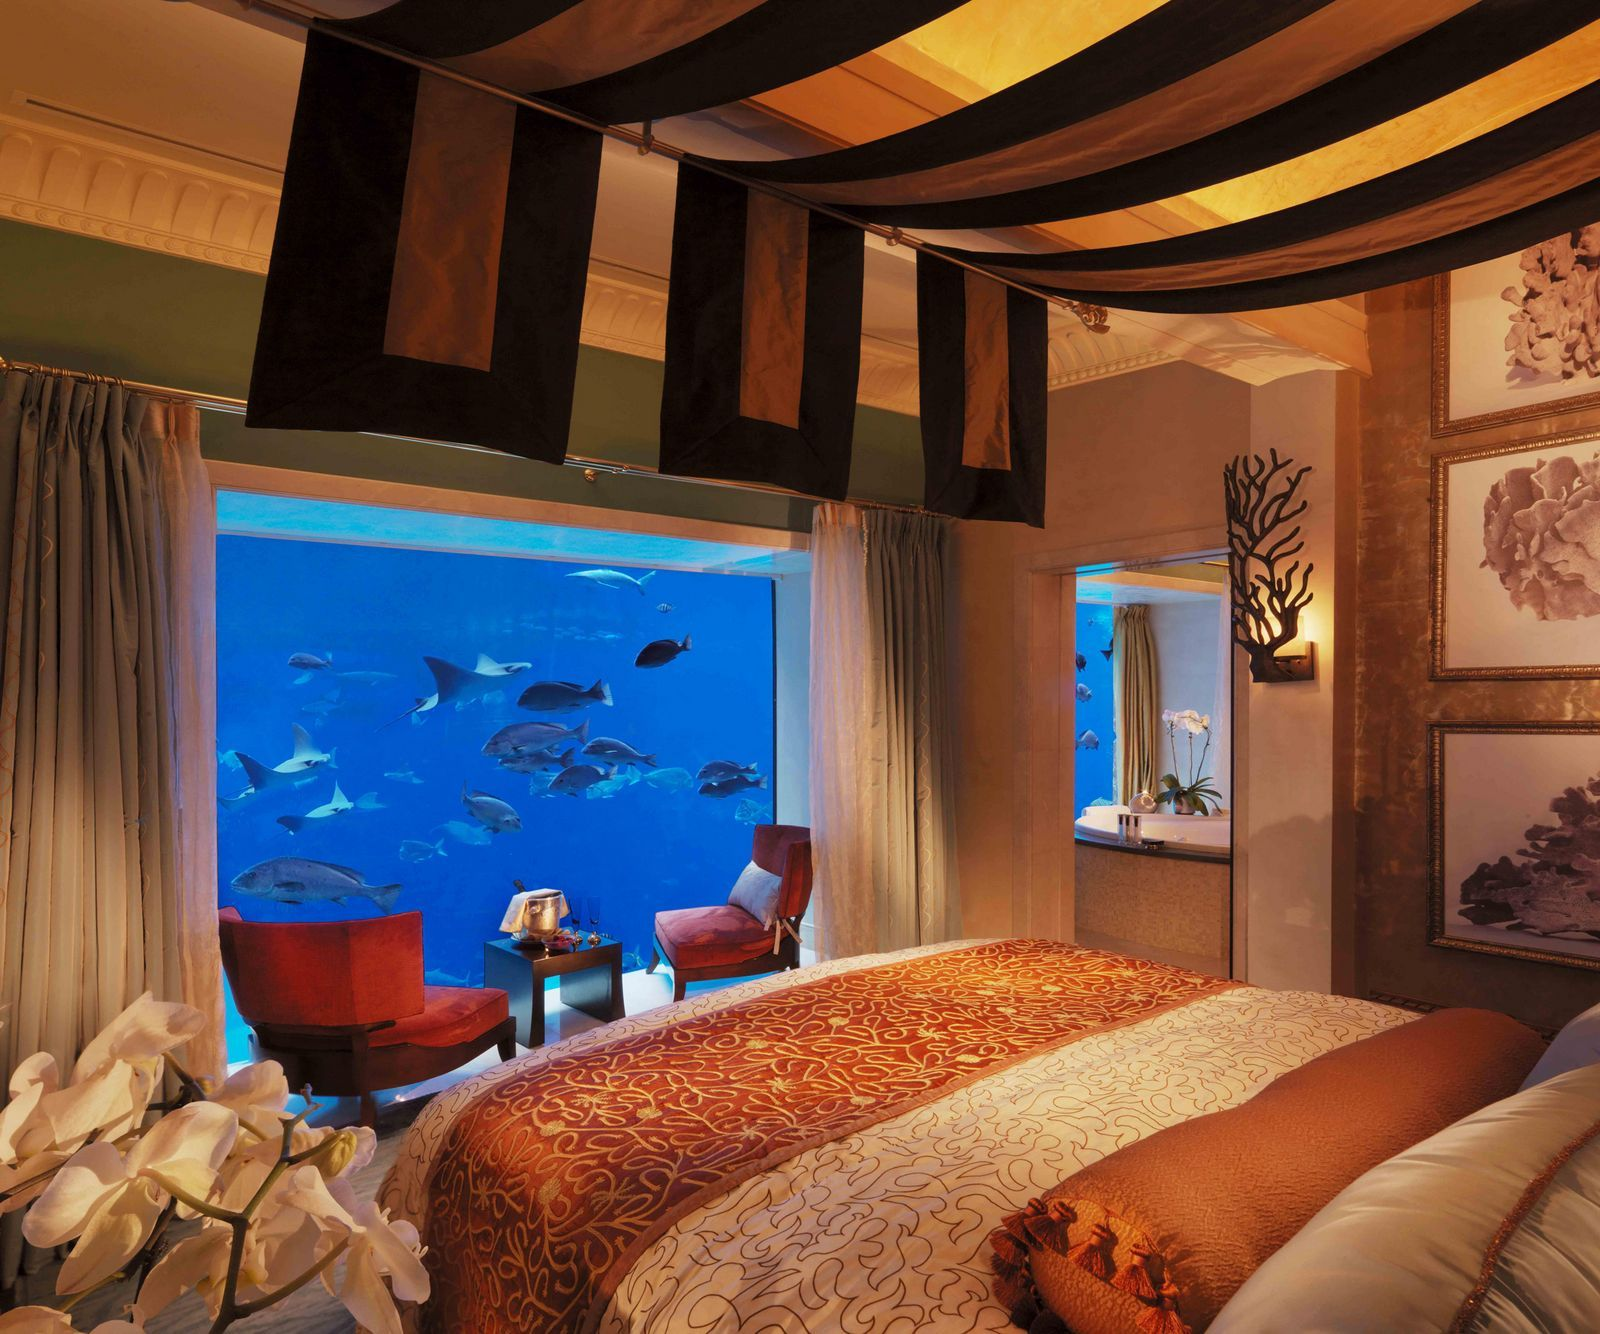 Atlantis dubai 2 underwater hotel underwater hotel room